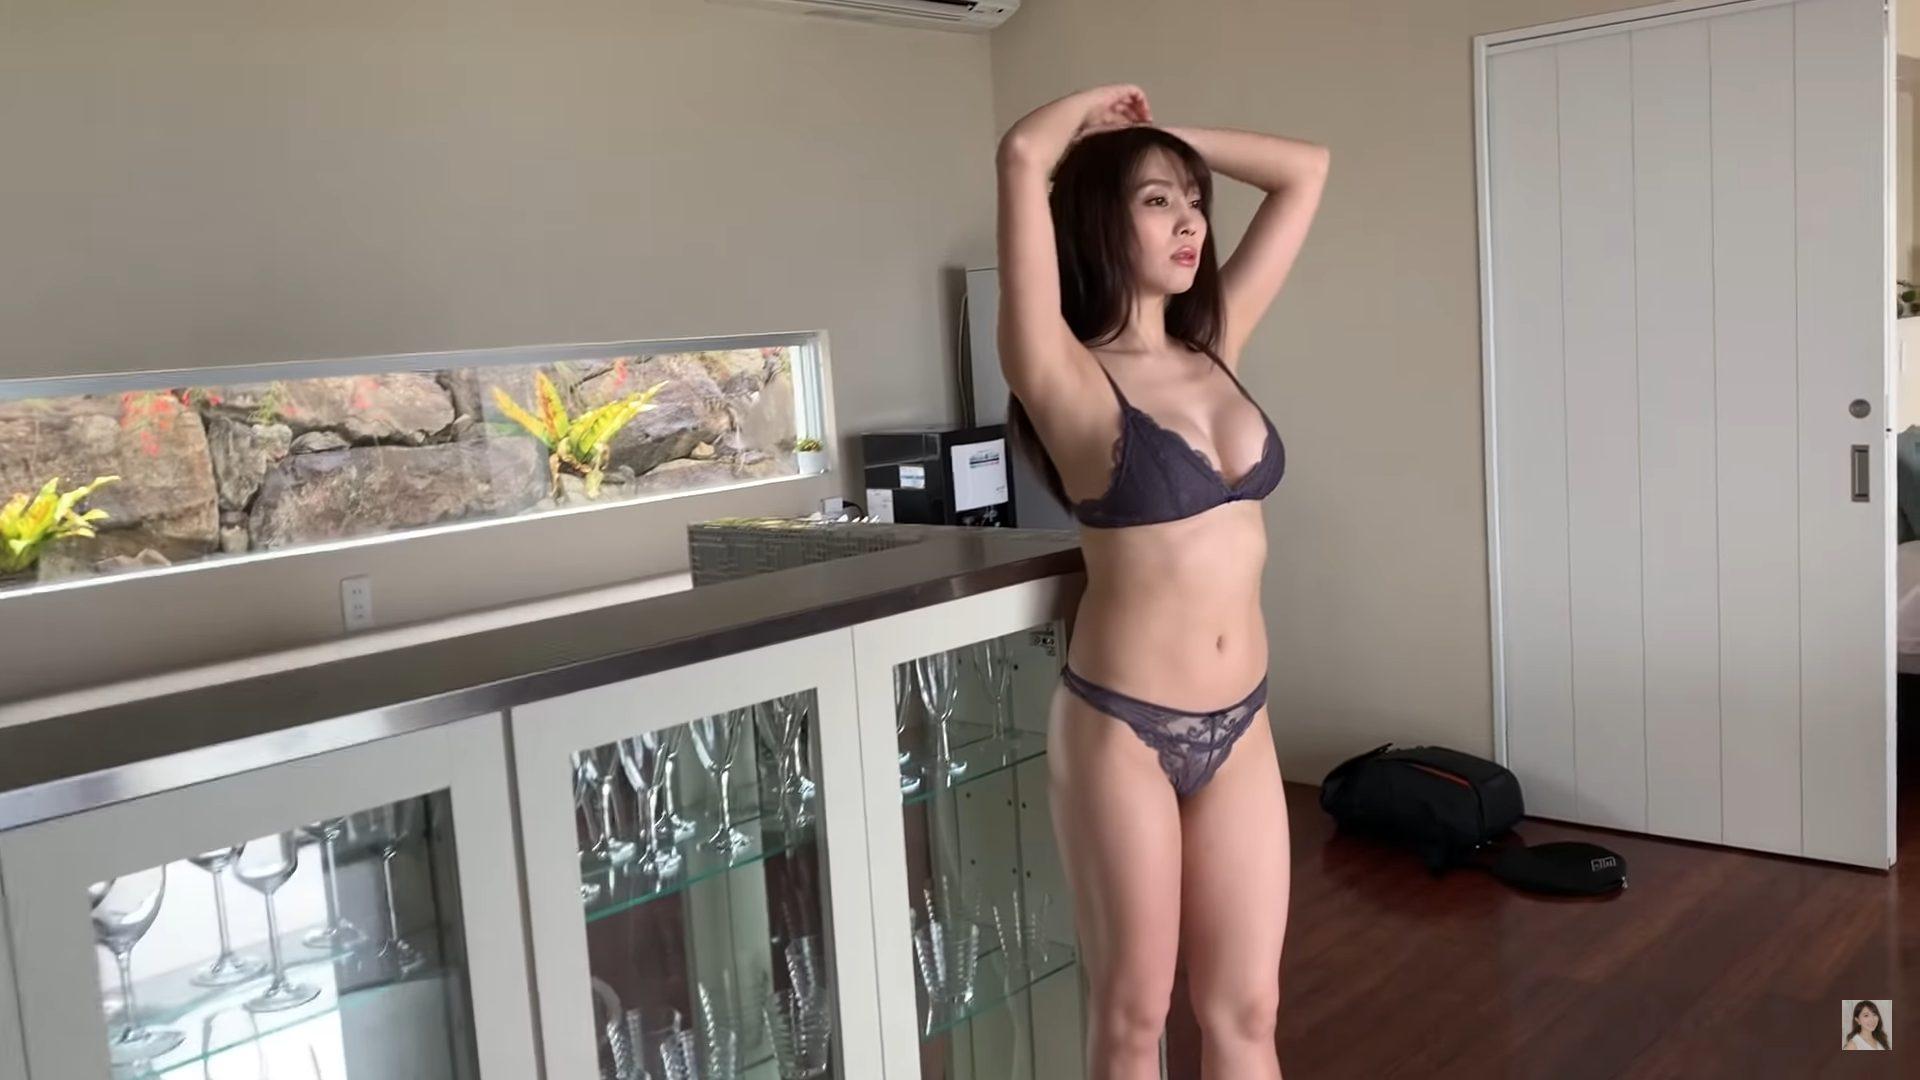 【森咲智美】Gカップ35 3rd写真集「Utopia 」撮影裏側動画!水着姿を披露!